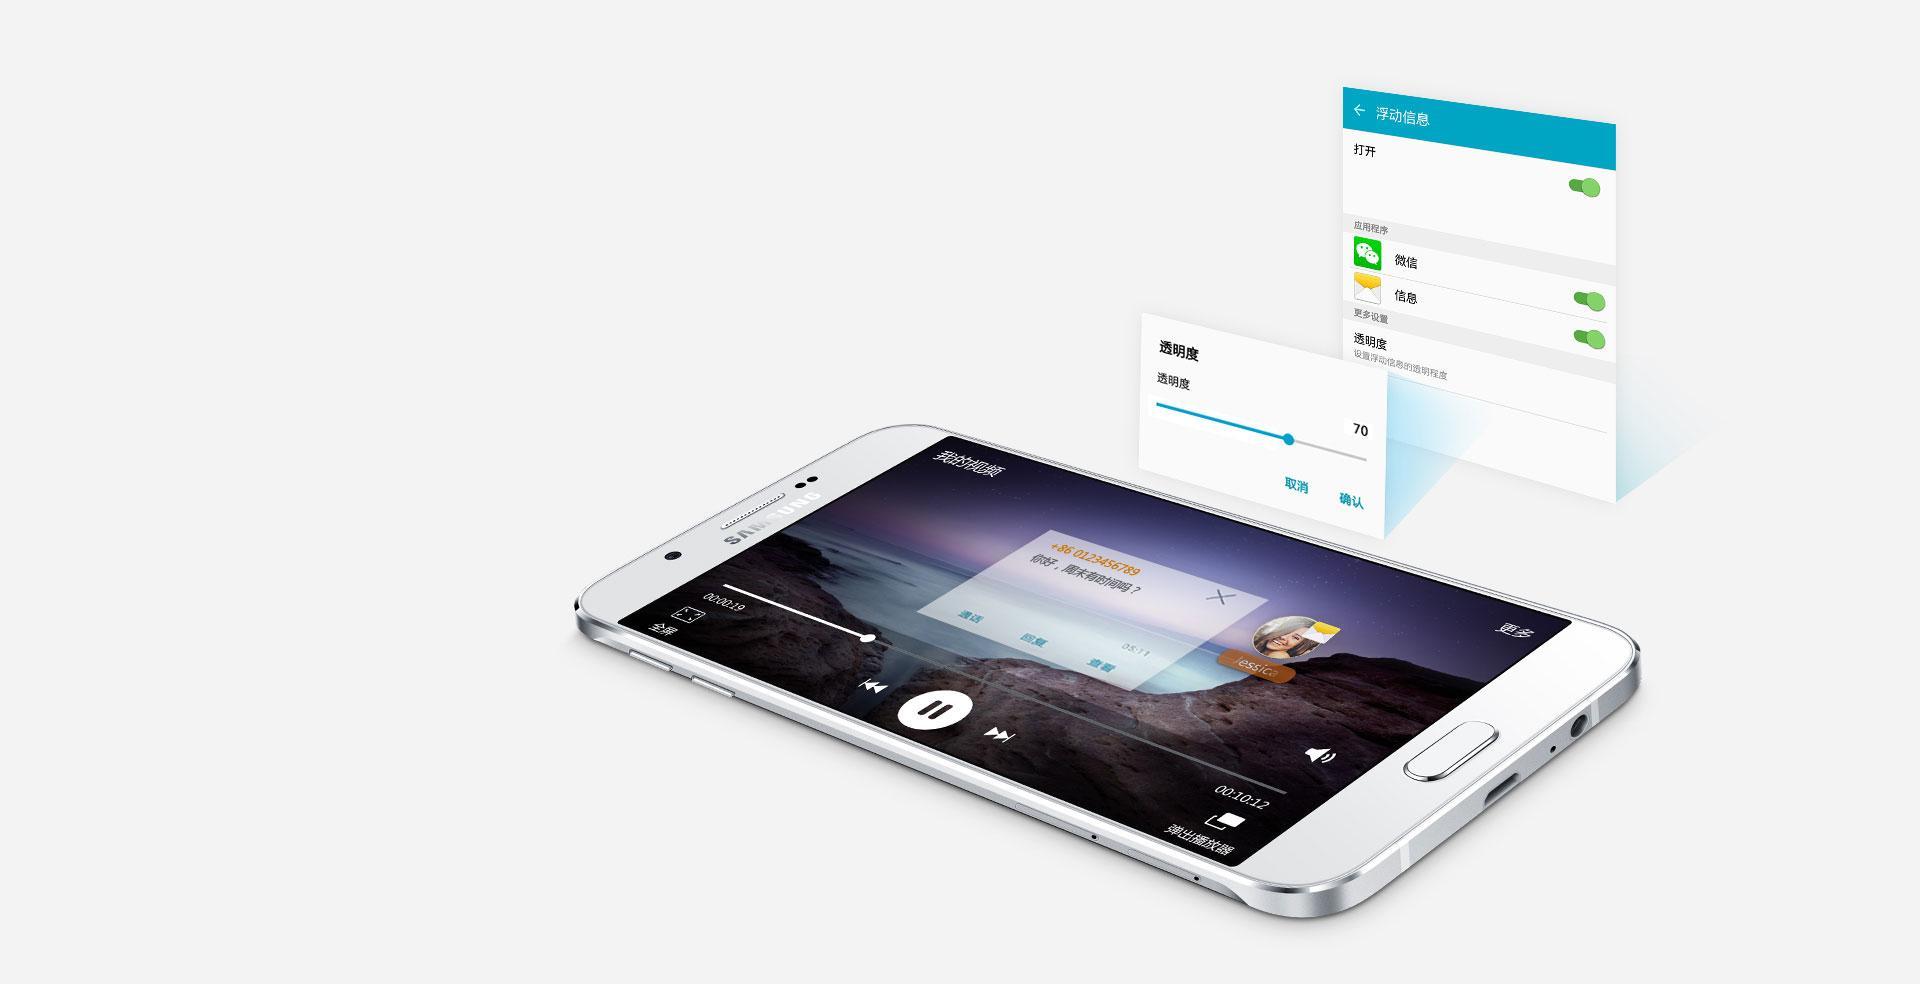 Samsung Galaxy A8 detalles del sistema operativo